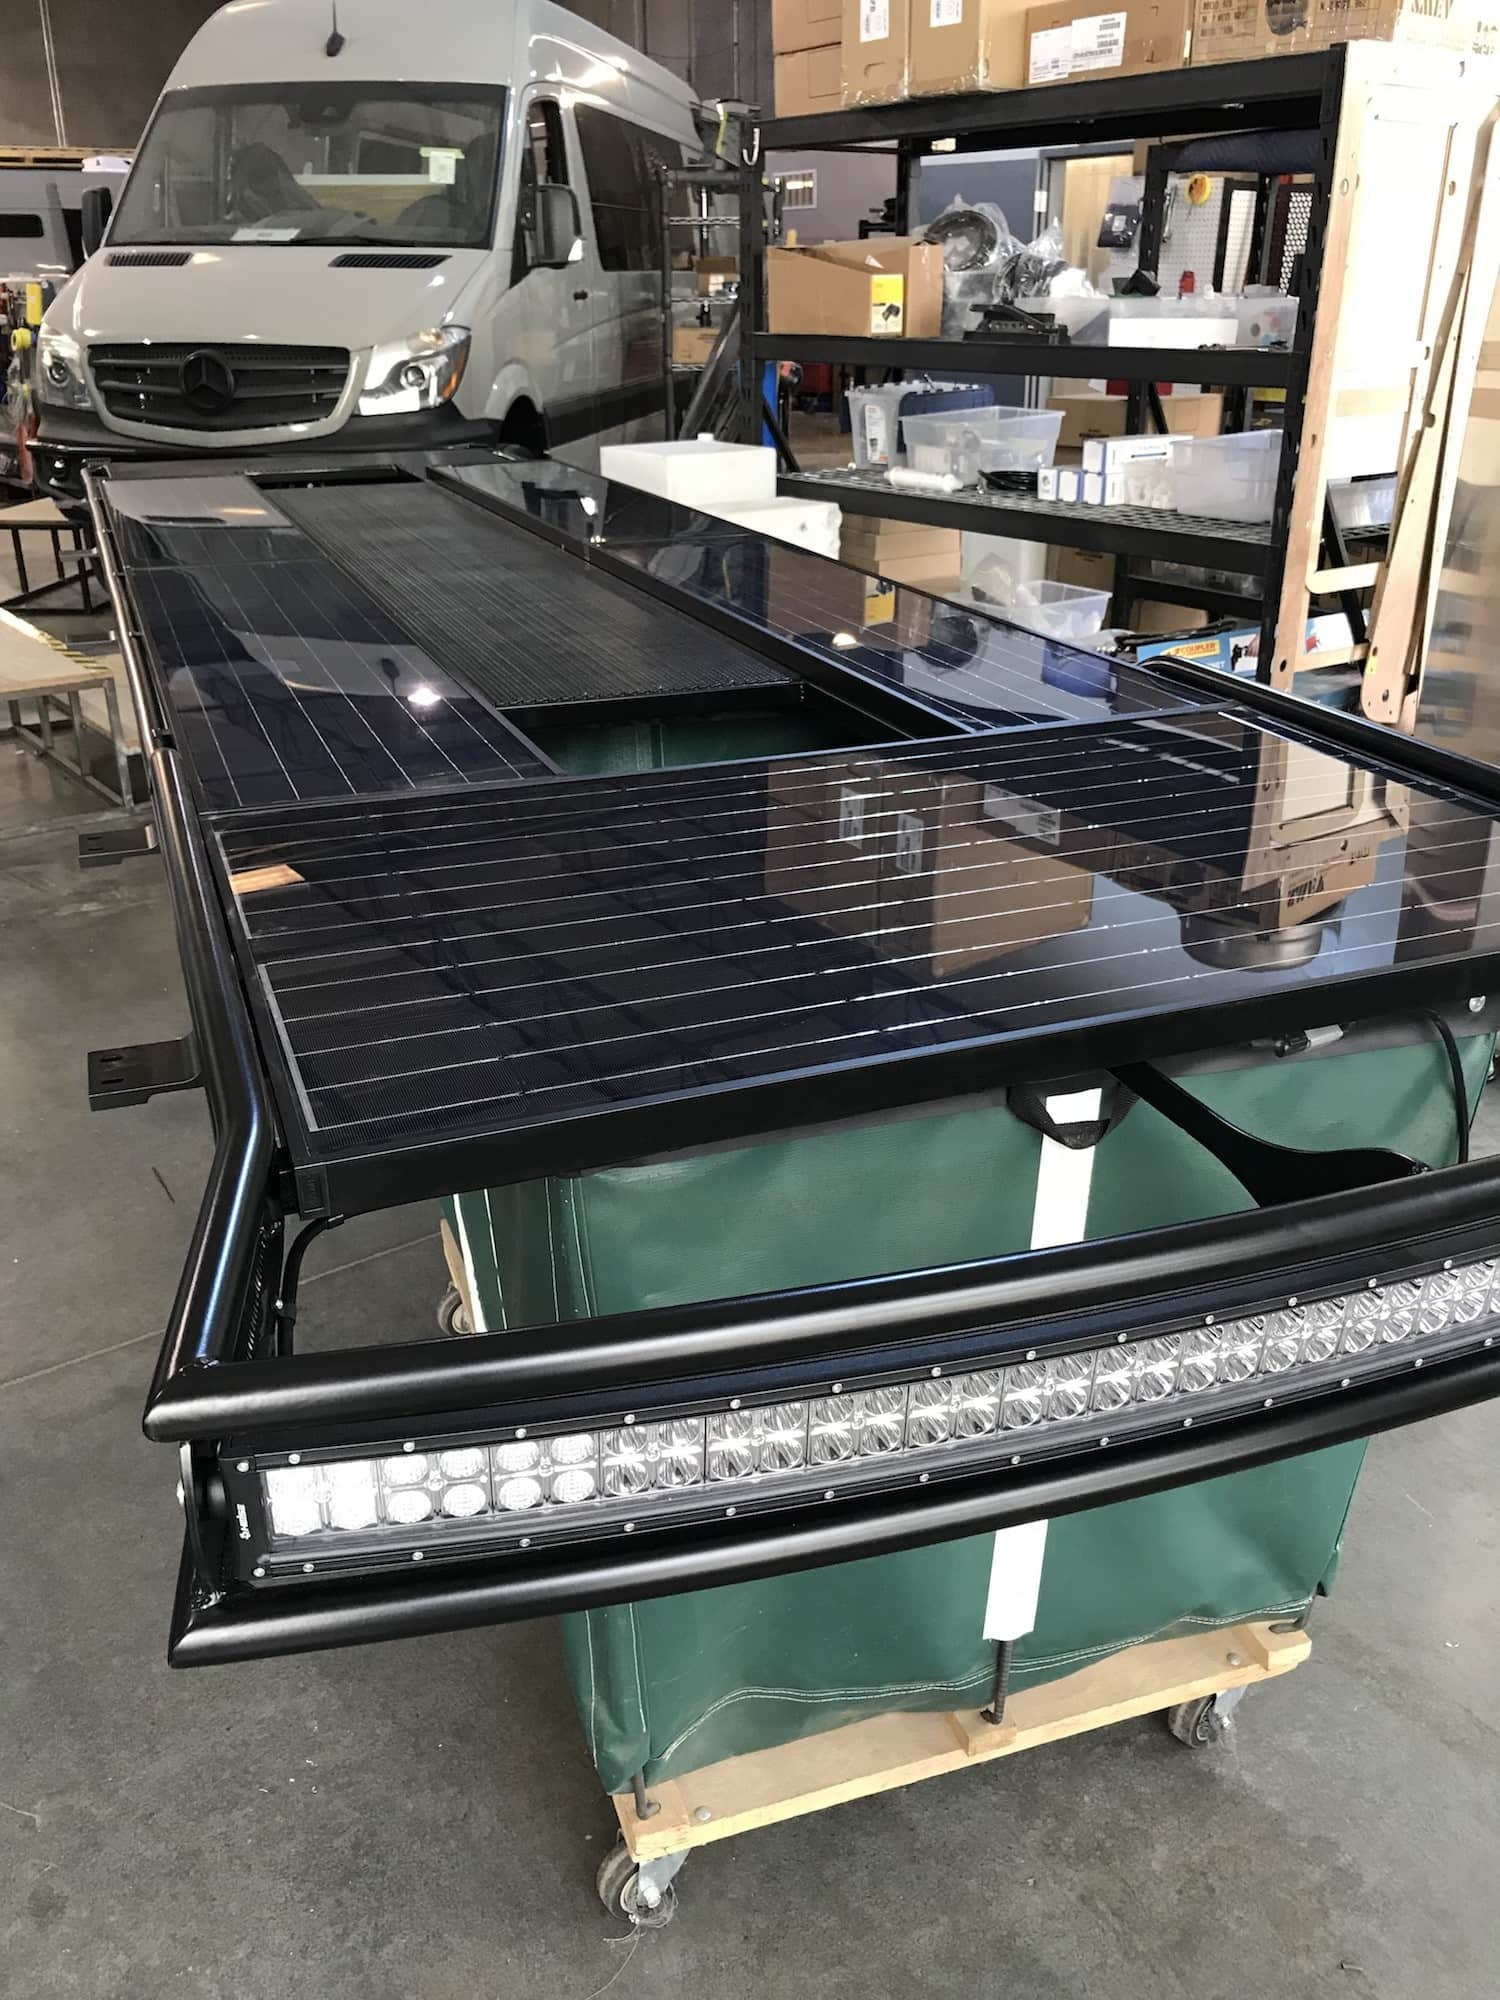 Outside Van Sprinter roof rack with Zamp solar panels and light bar